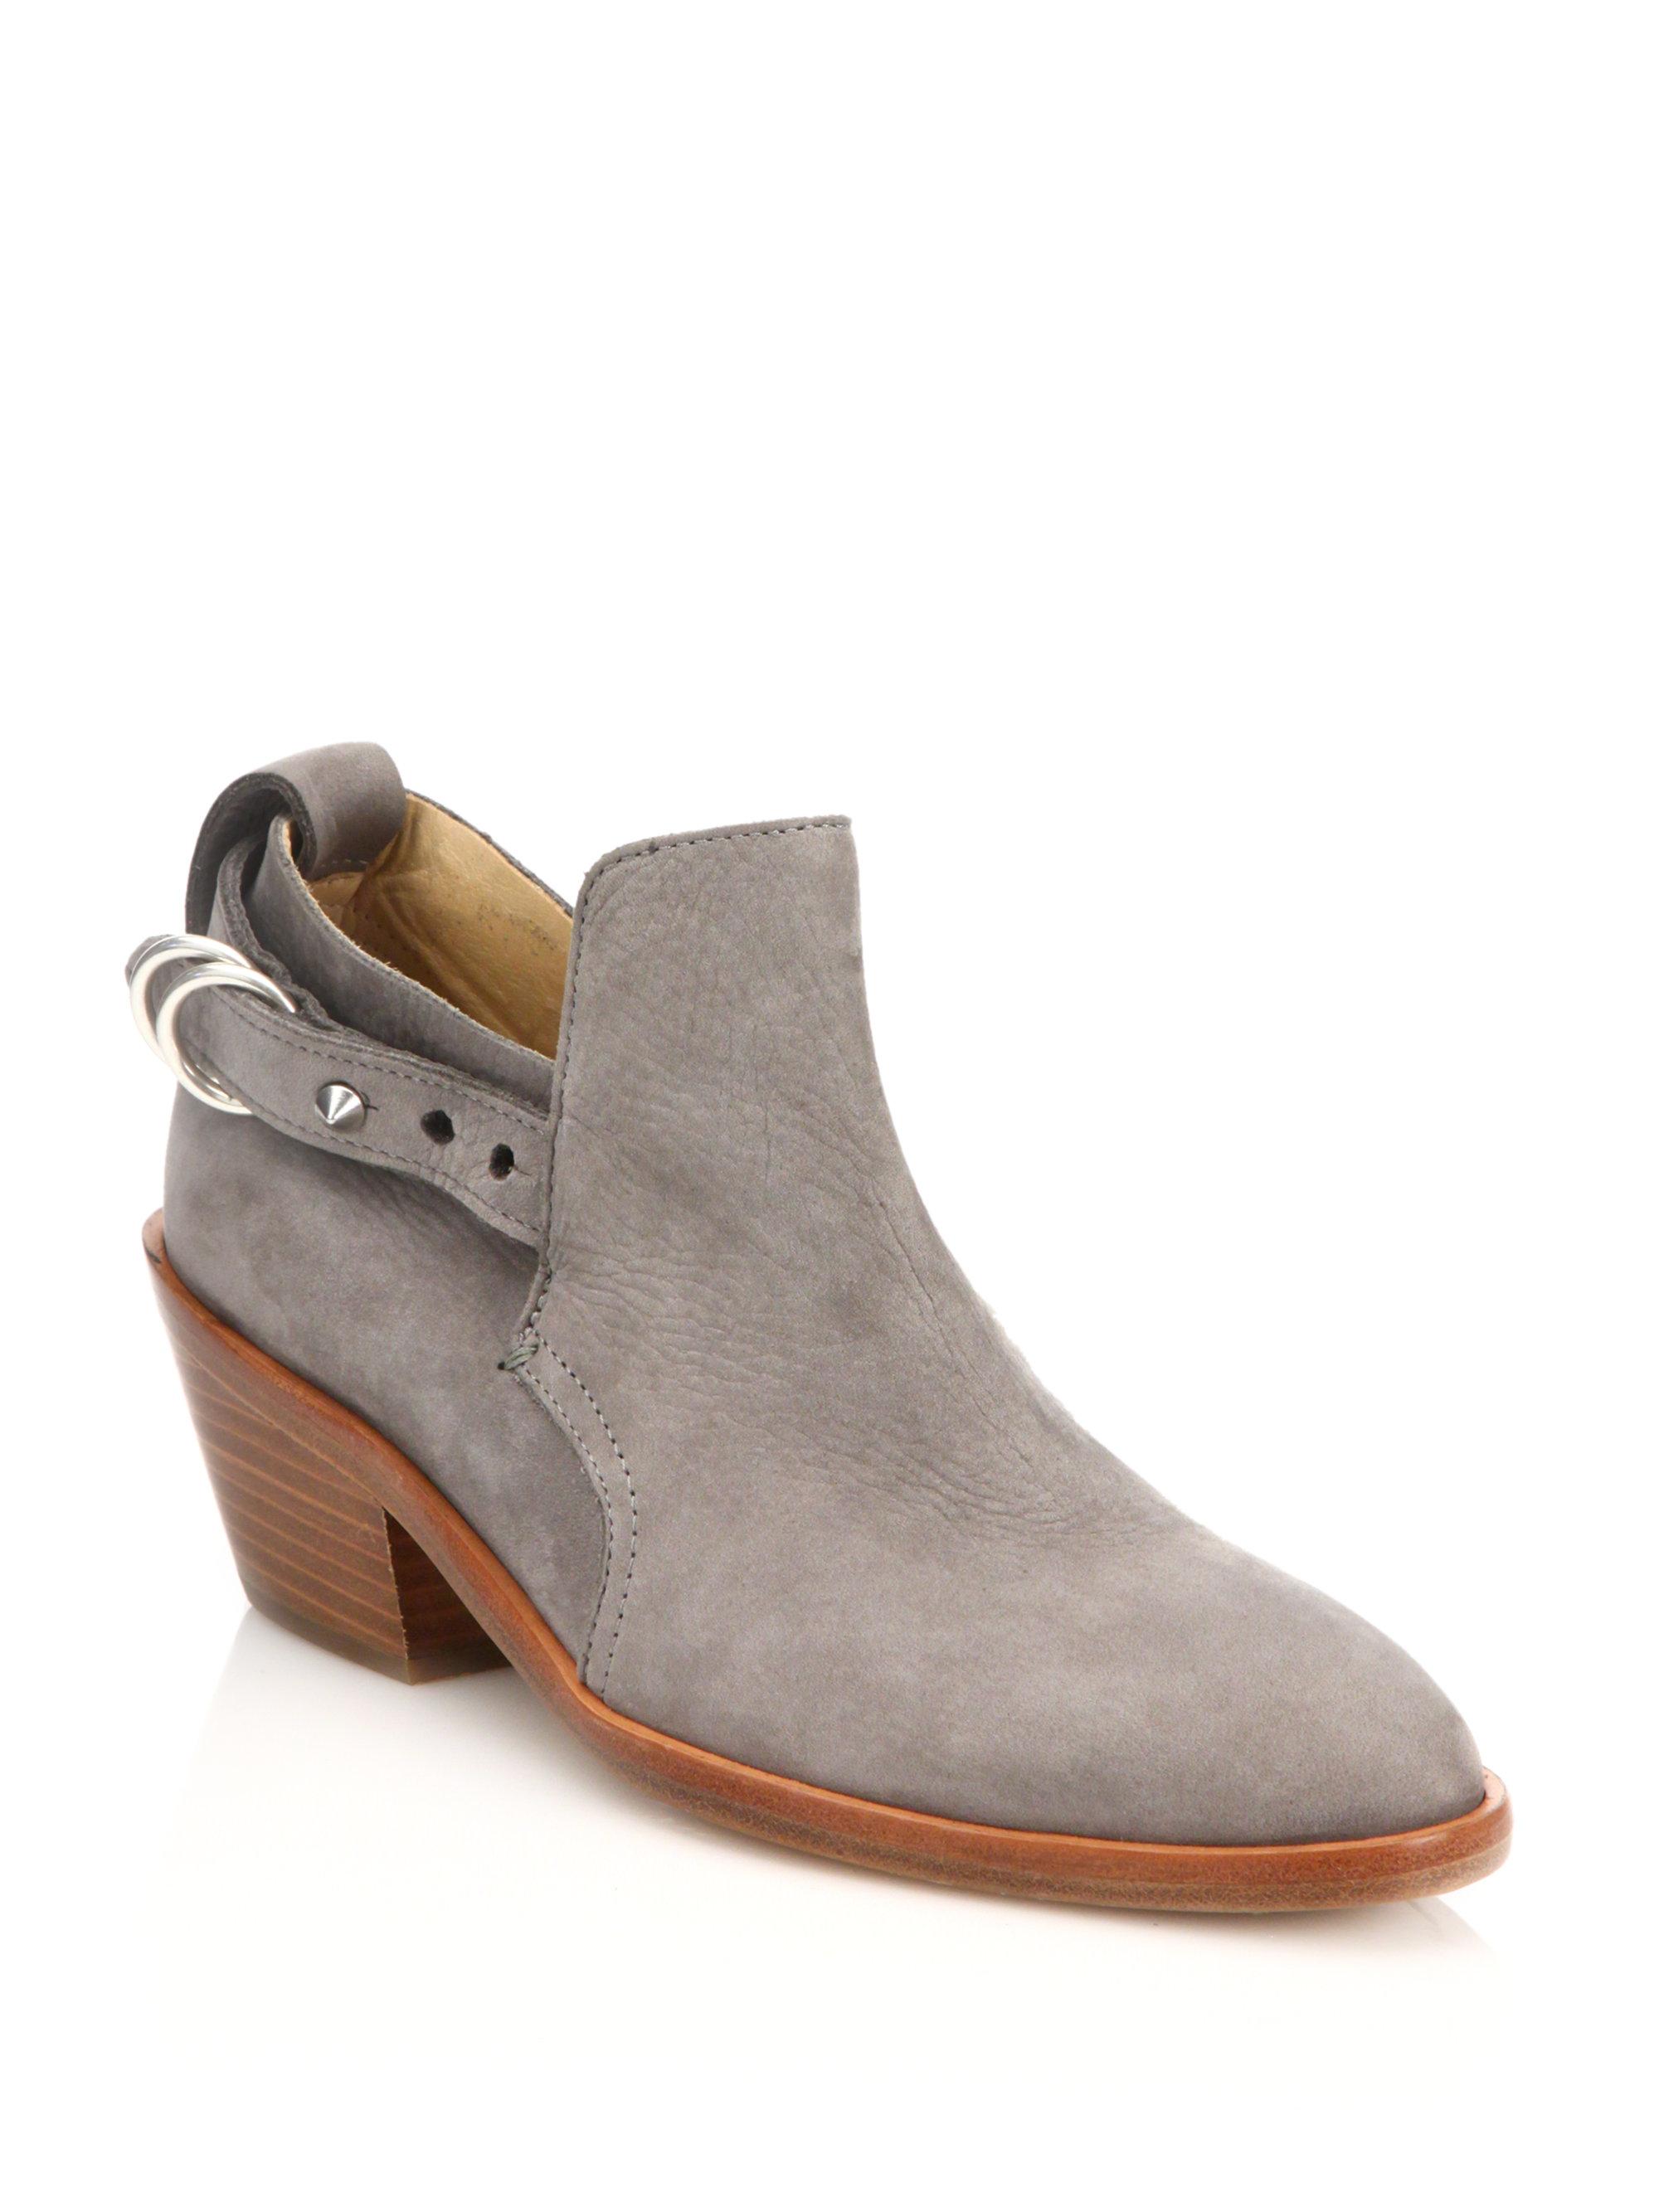 Rag Amp Bone Sullivan Nubuck Leather Ankle Boots In Gray Lyst